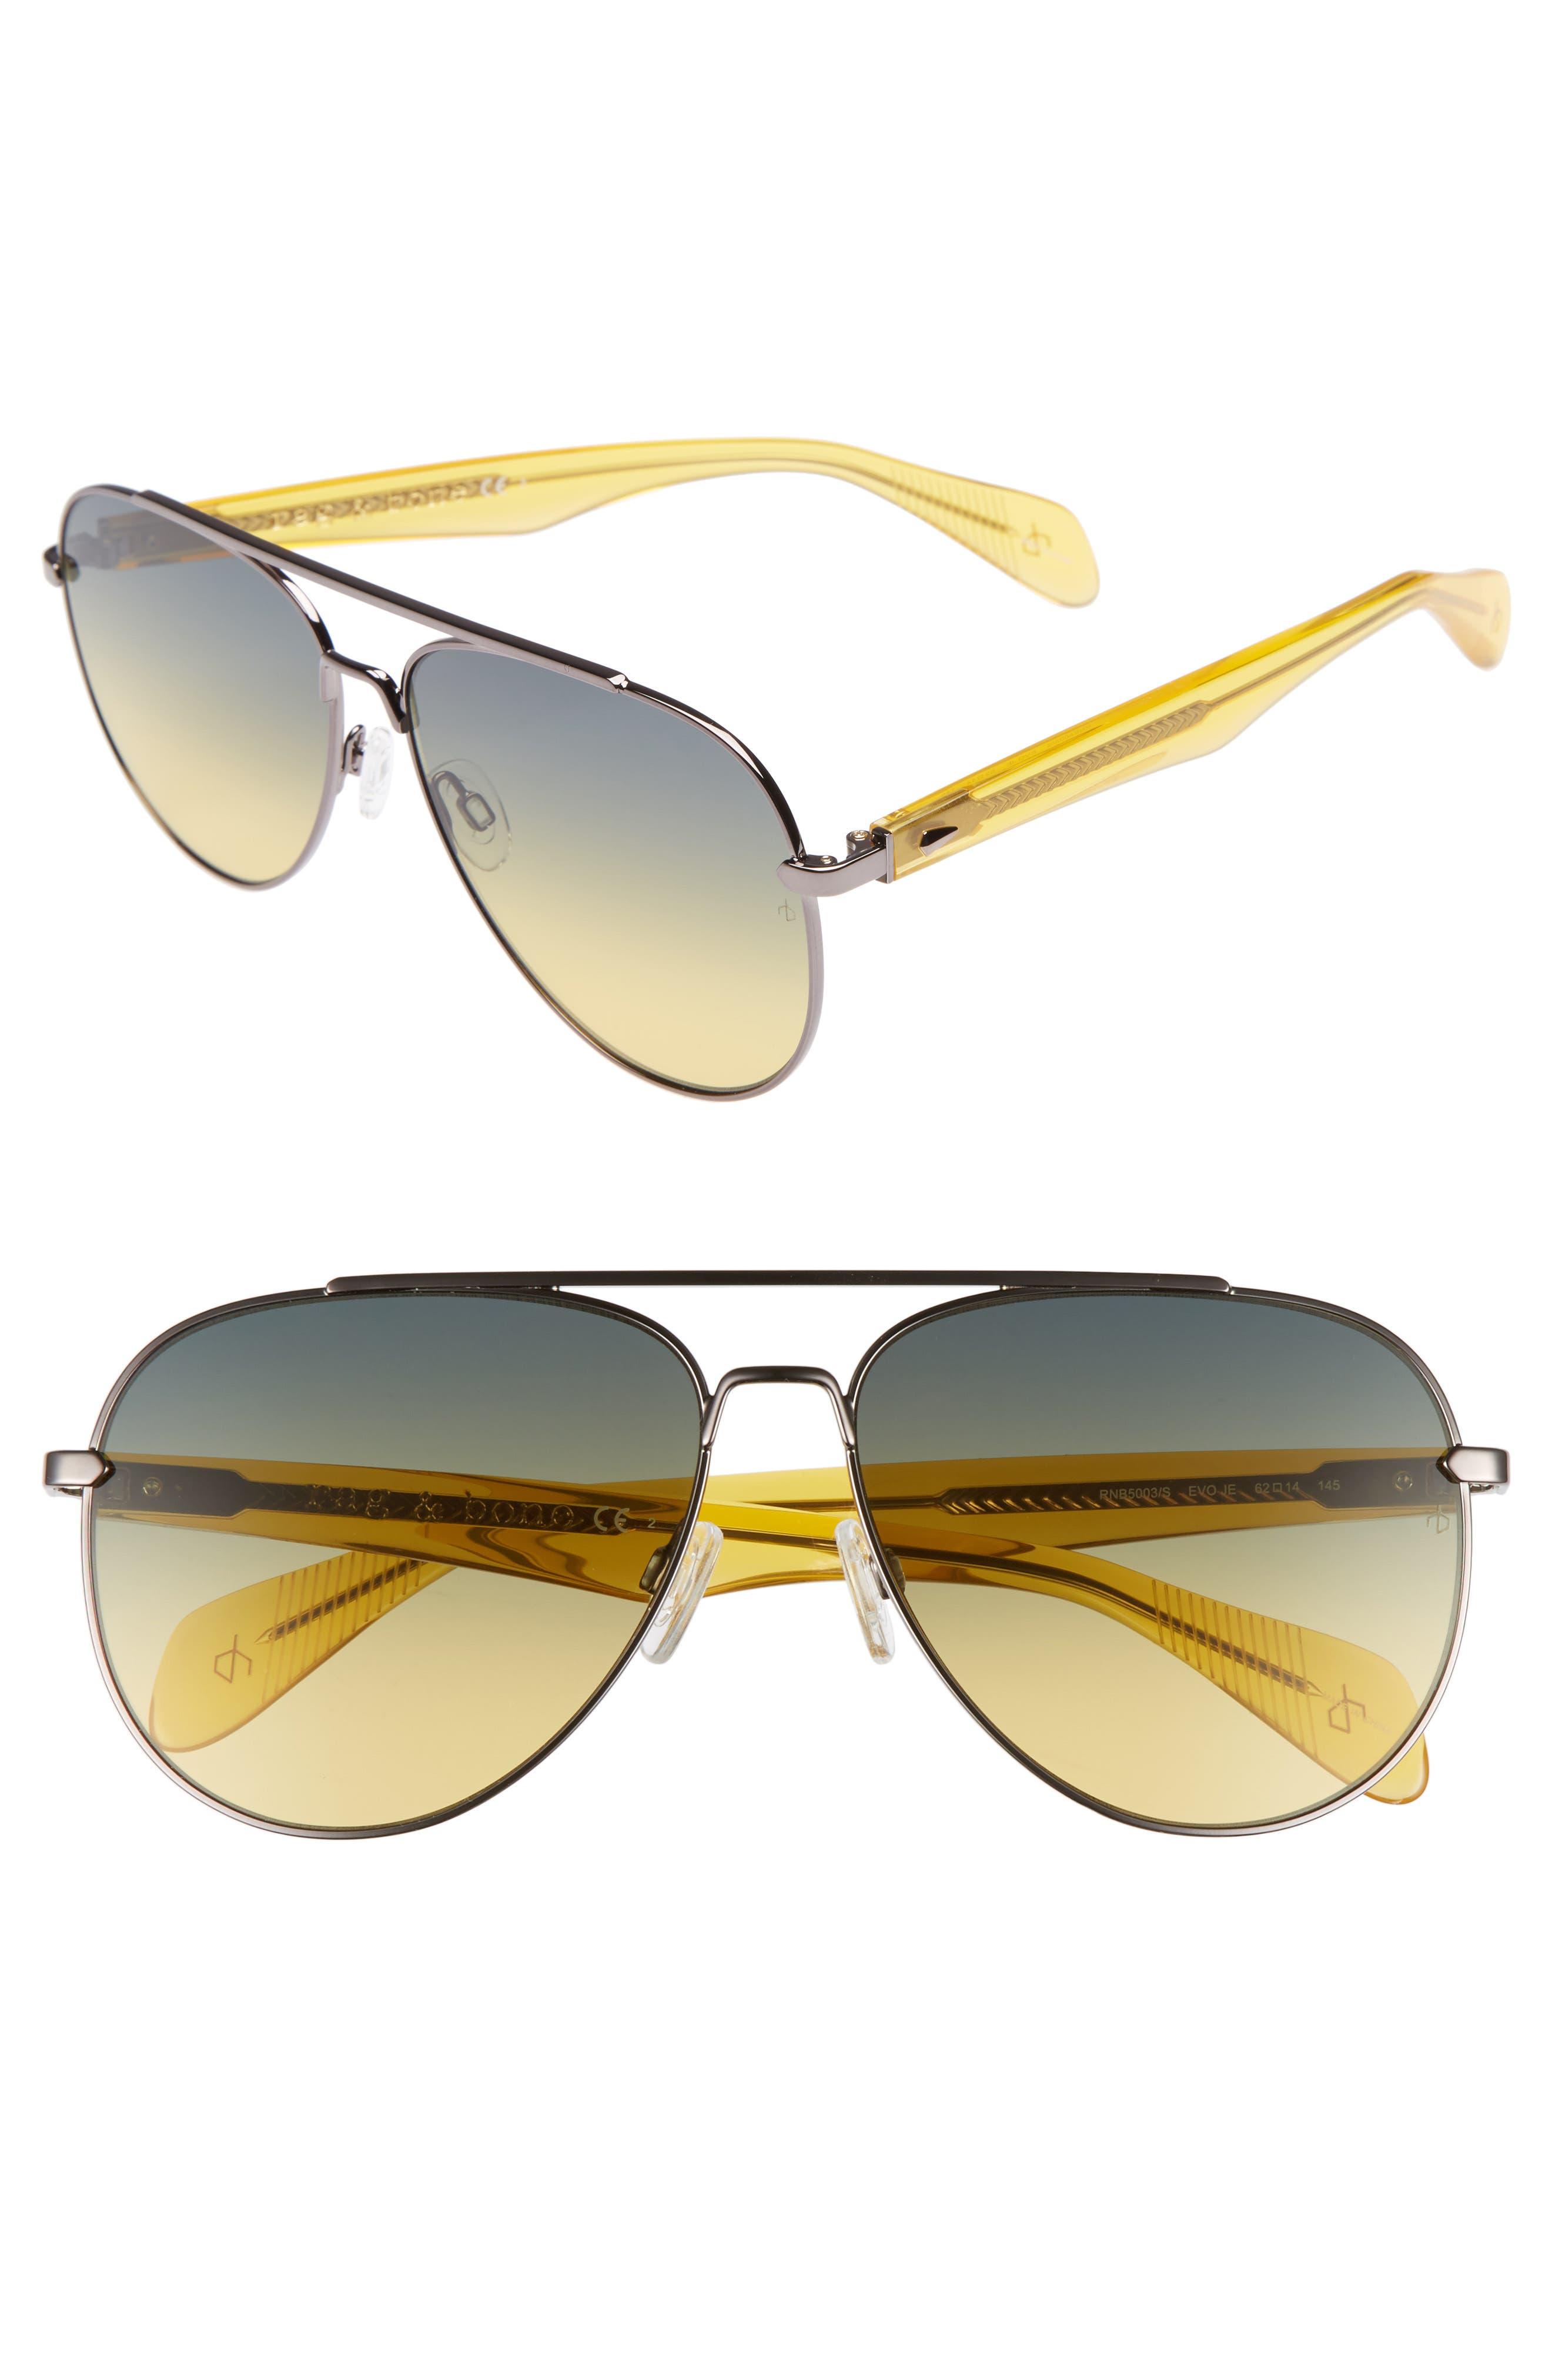 62mm Oversize Aviator Sunglasses,                             Main thumbnail 1, color,                             220